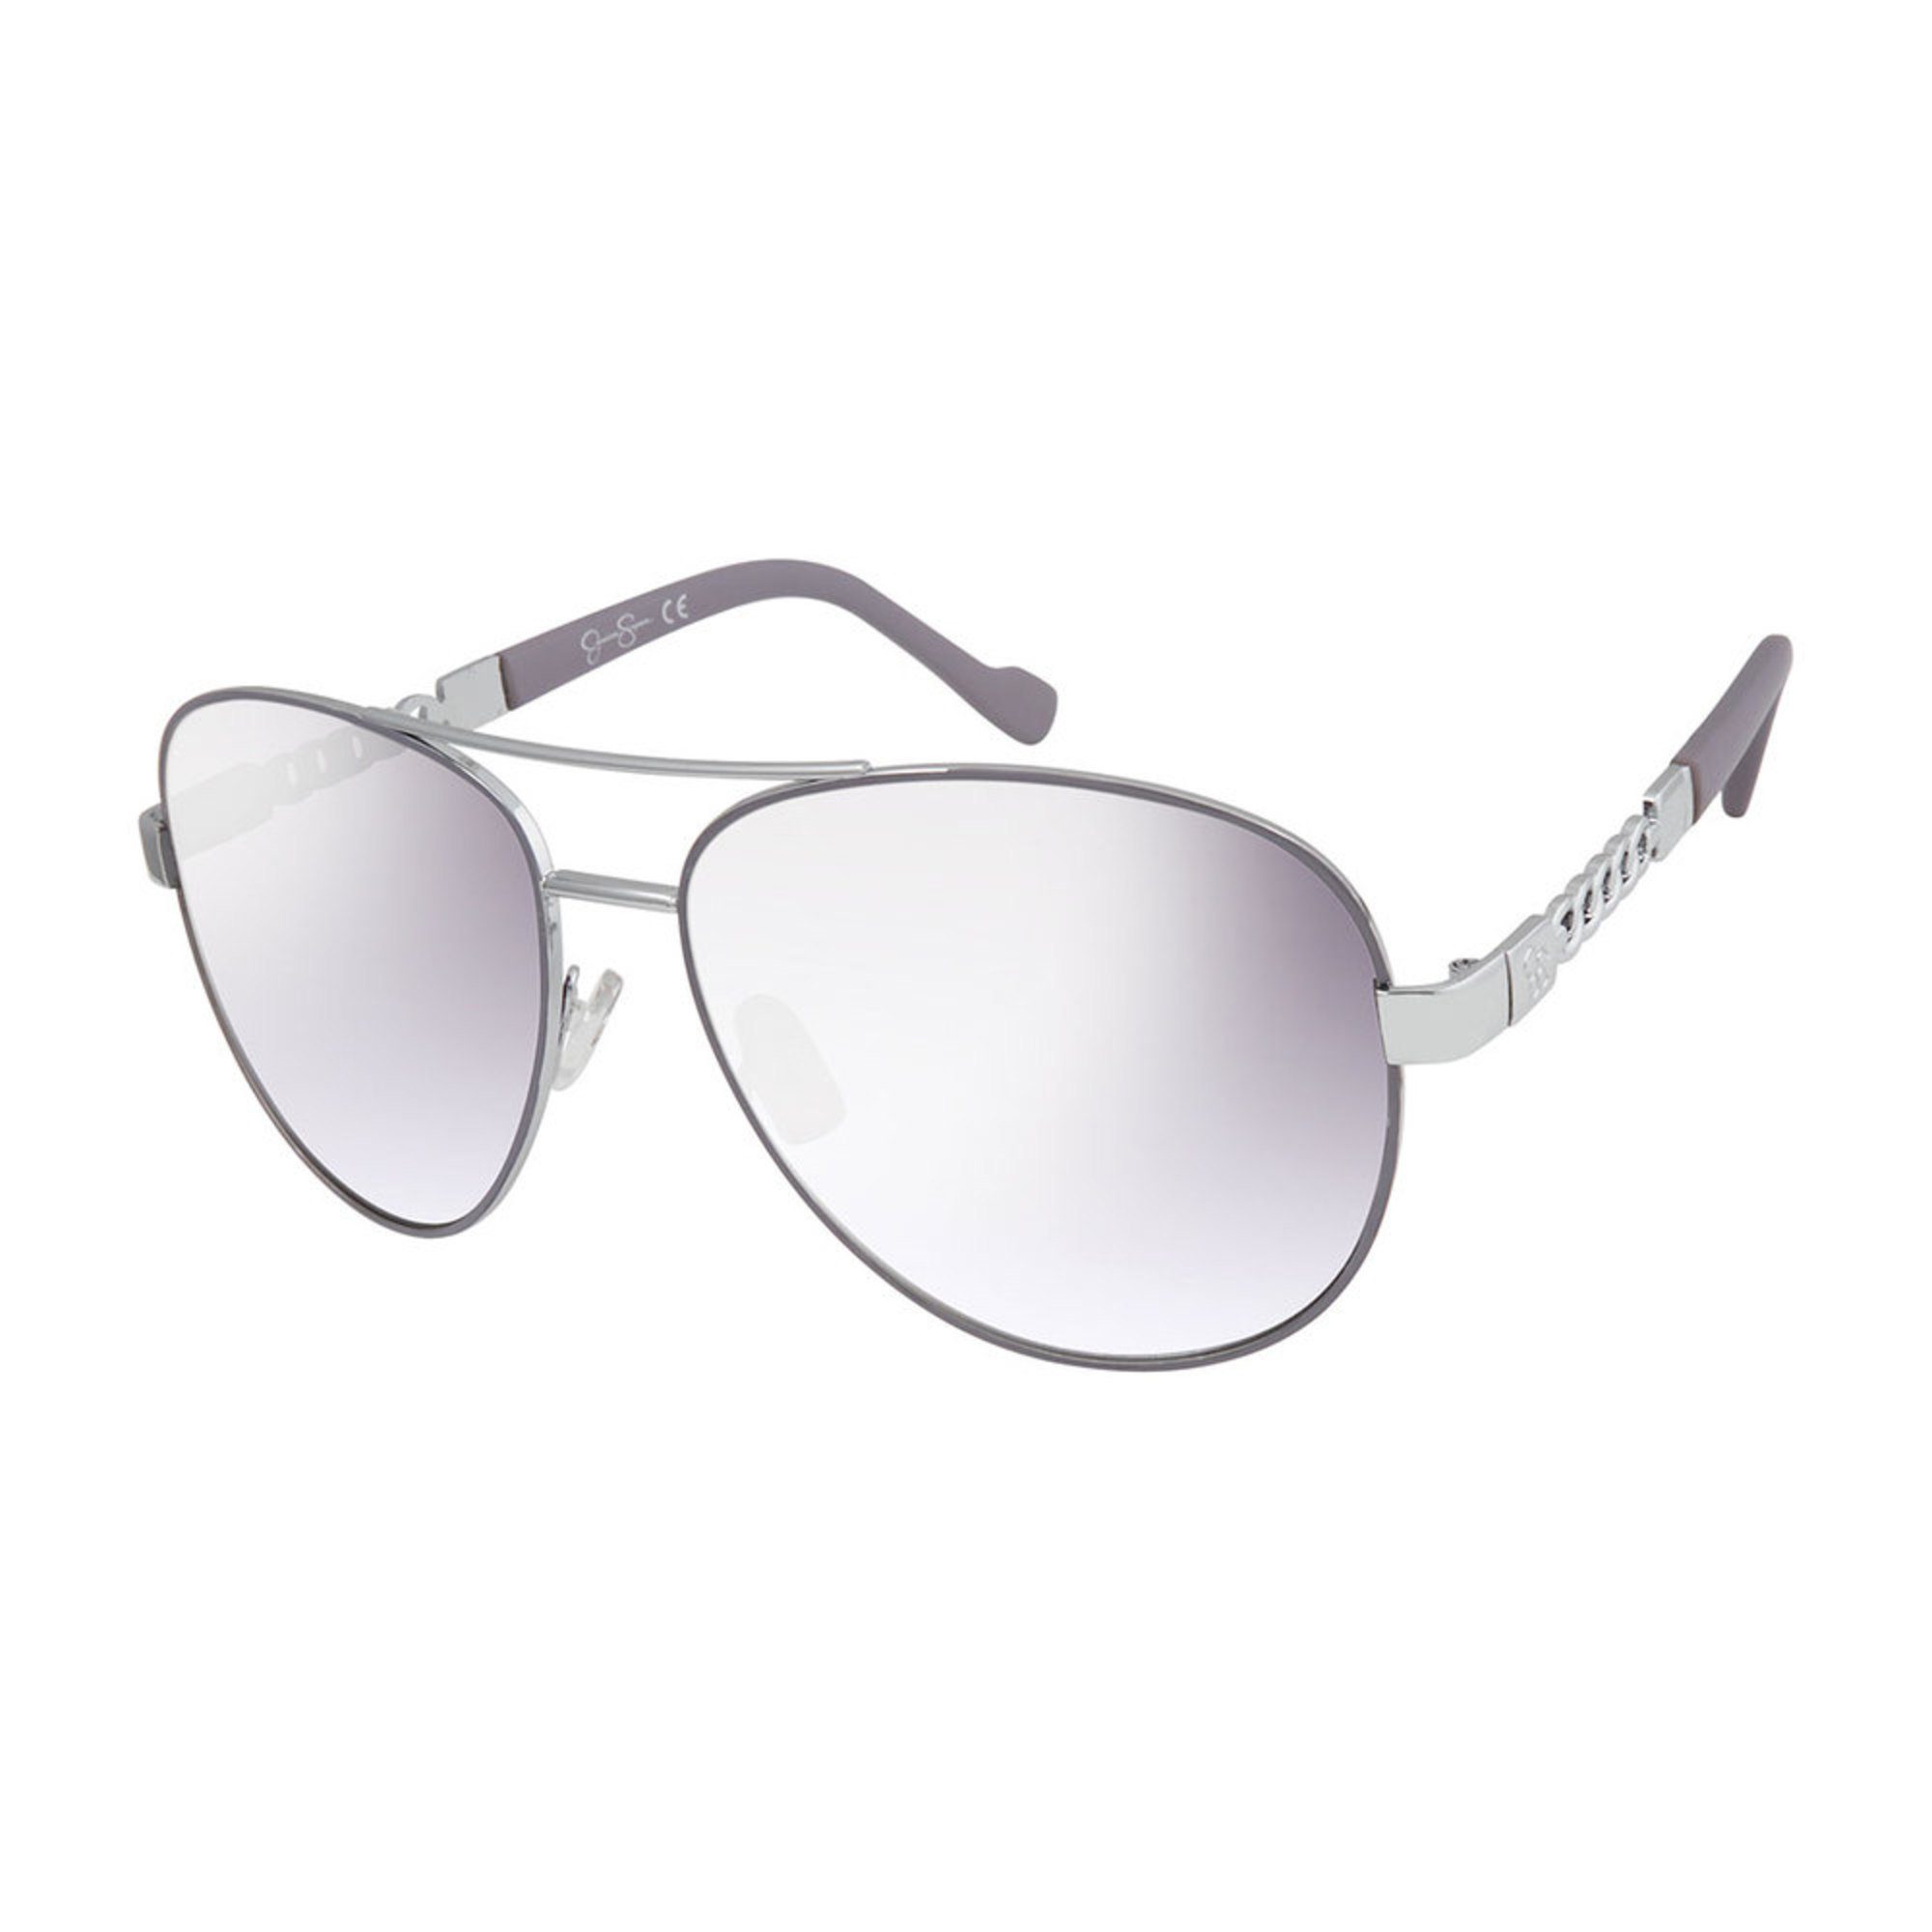 883667616a Jessica Simpson. Jessica Simpson Women s Aviator Sunglasses